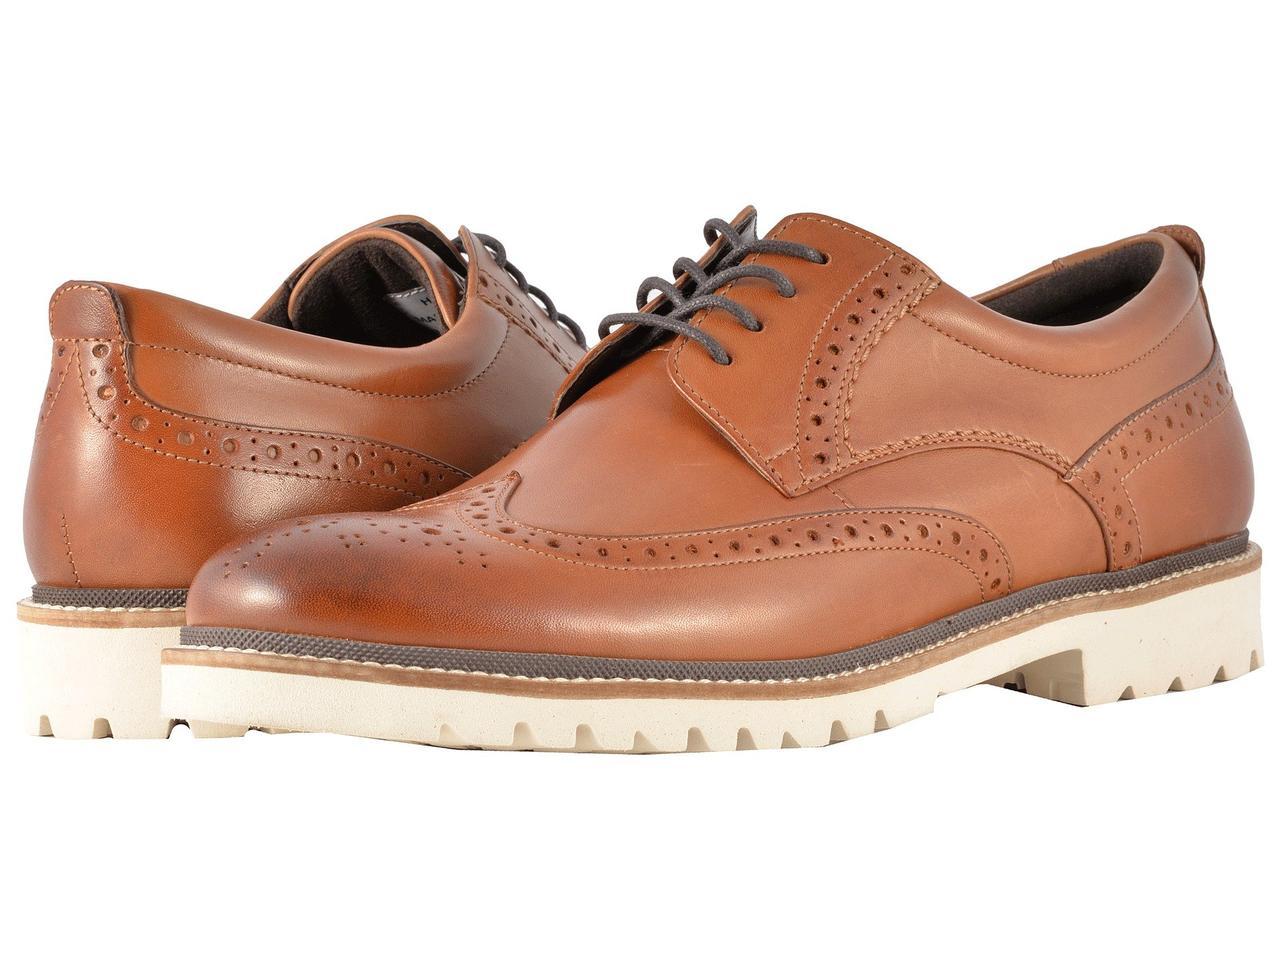 Туфли (Оригинал) Rockport Marshall Wingtip Cognac Leather